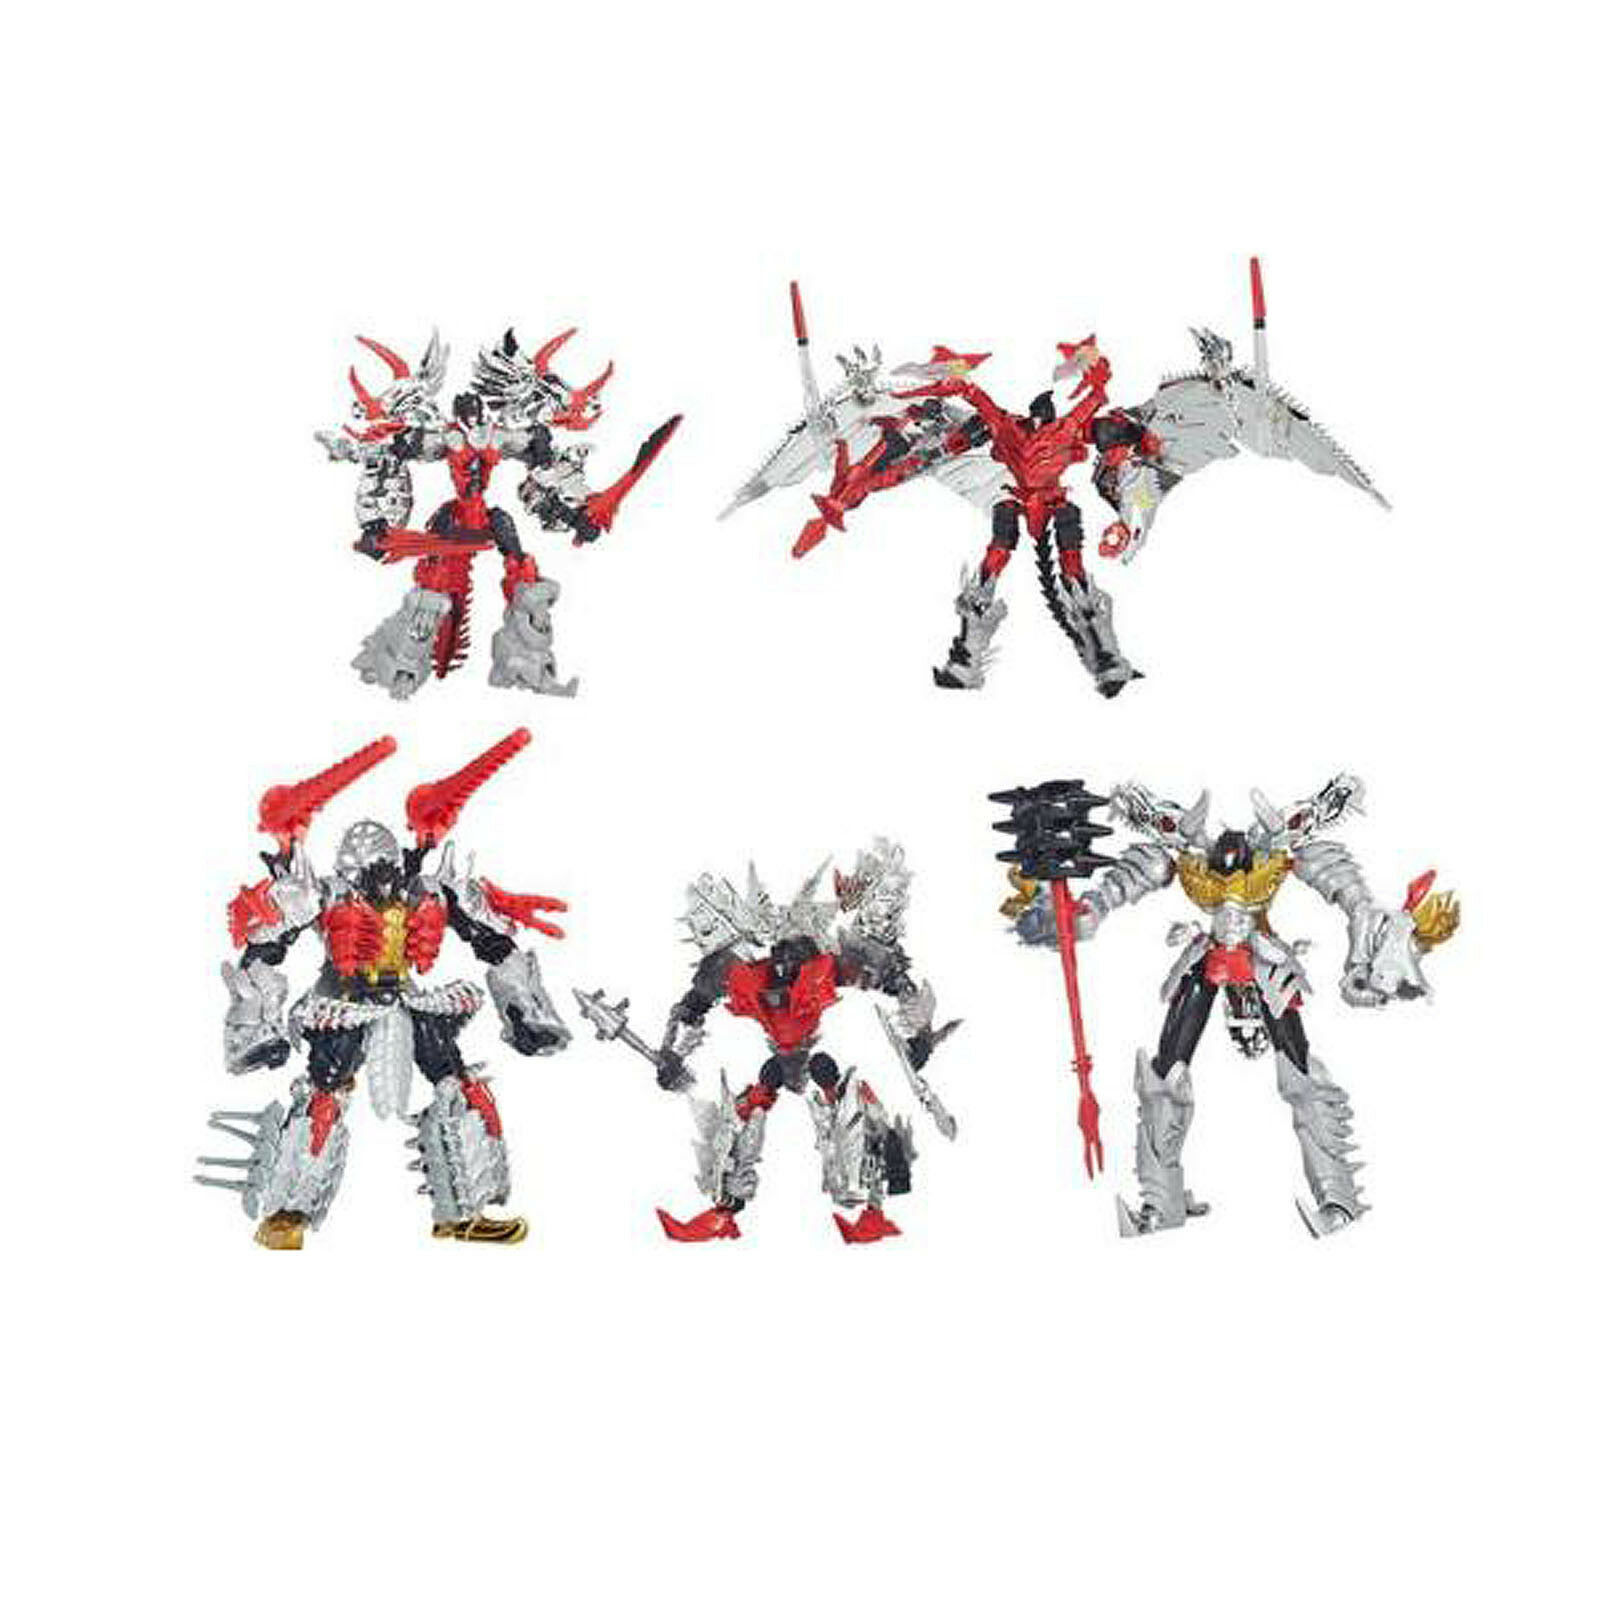 conveniente Transformers Age of Extinction Platinum Edition Dinobots Action Figure Figure Figure  buena reputación